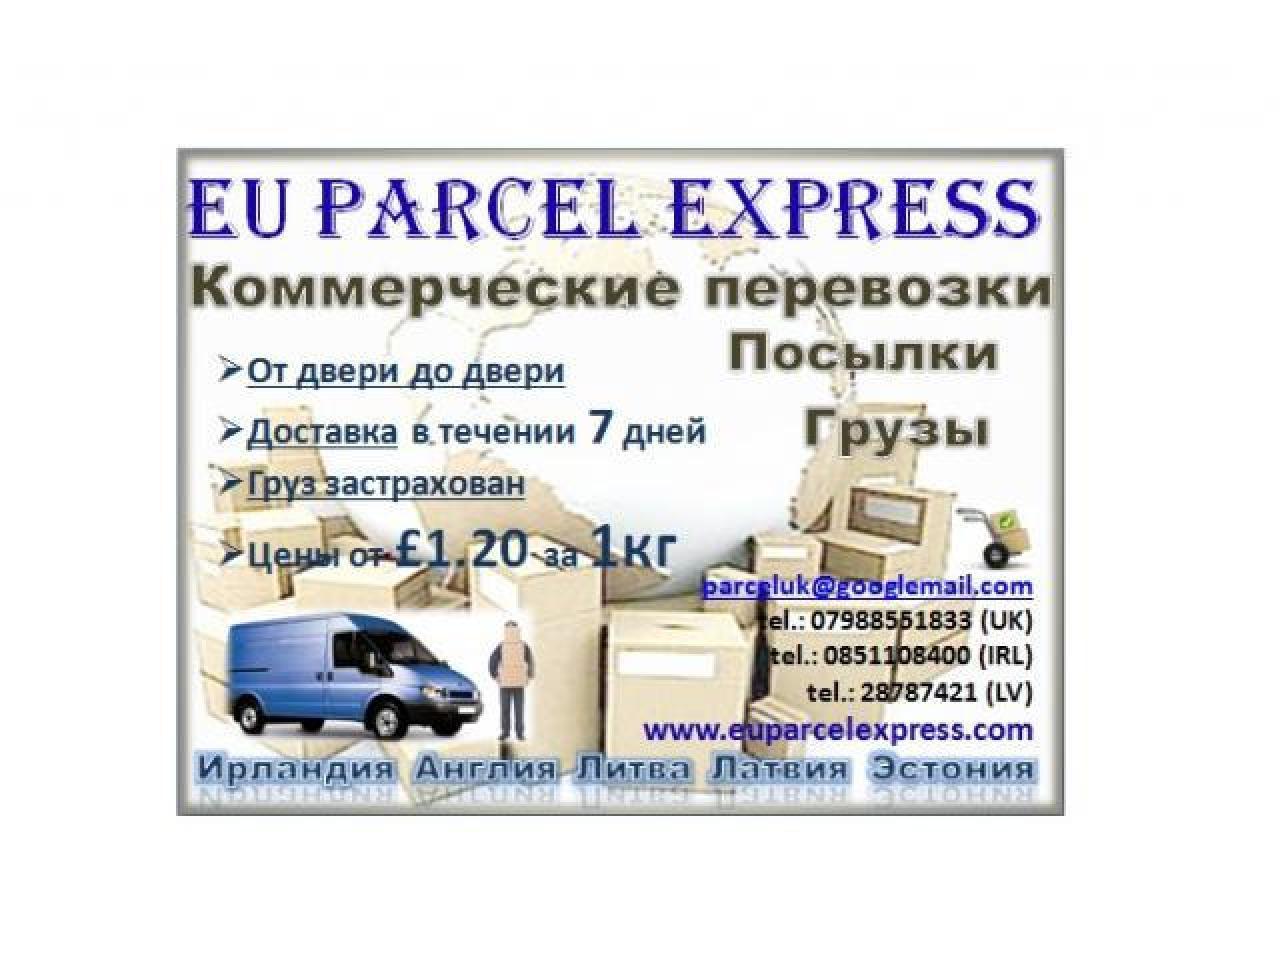 ''EU Parcel Express'' Доставка грузов и посылок Ирландия Англия Литва Латвия Эстония - 1